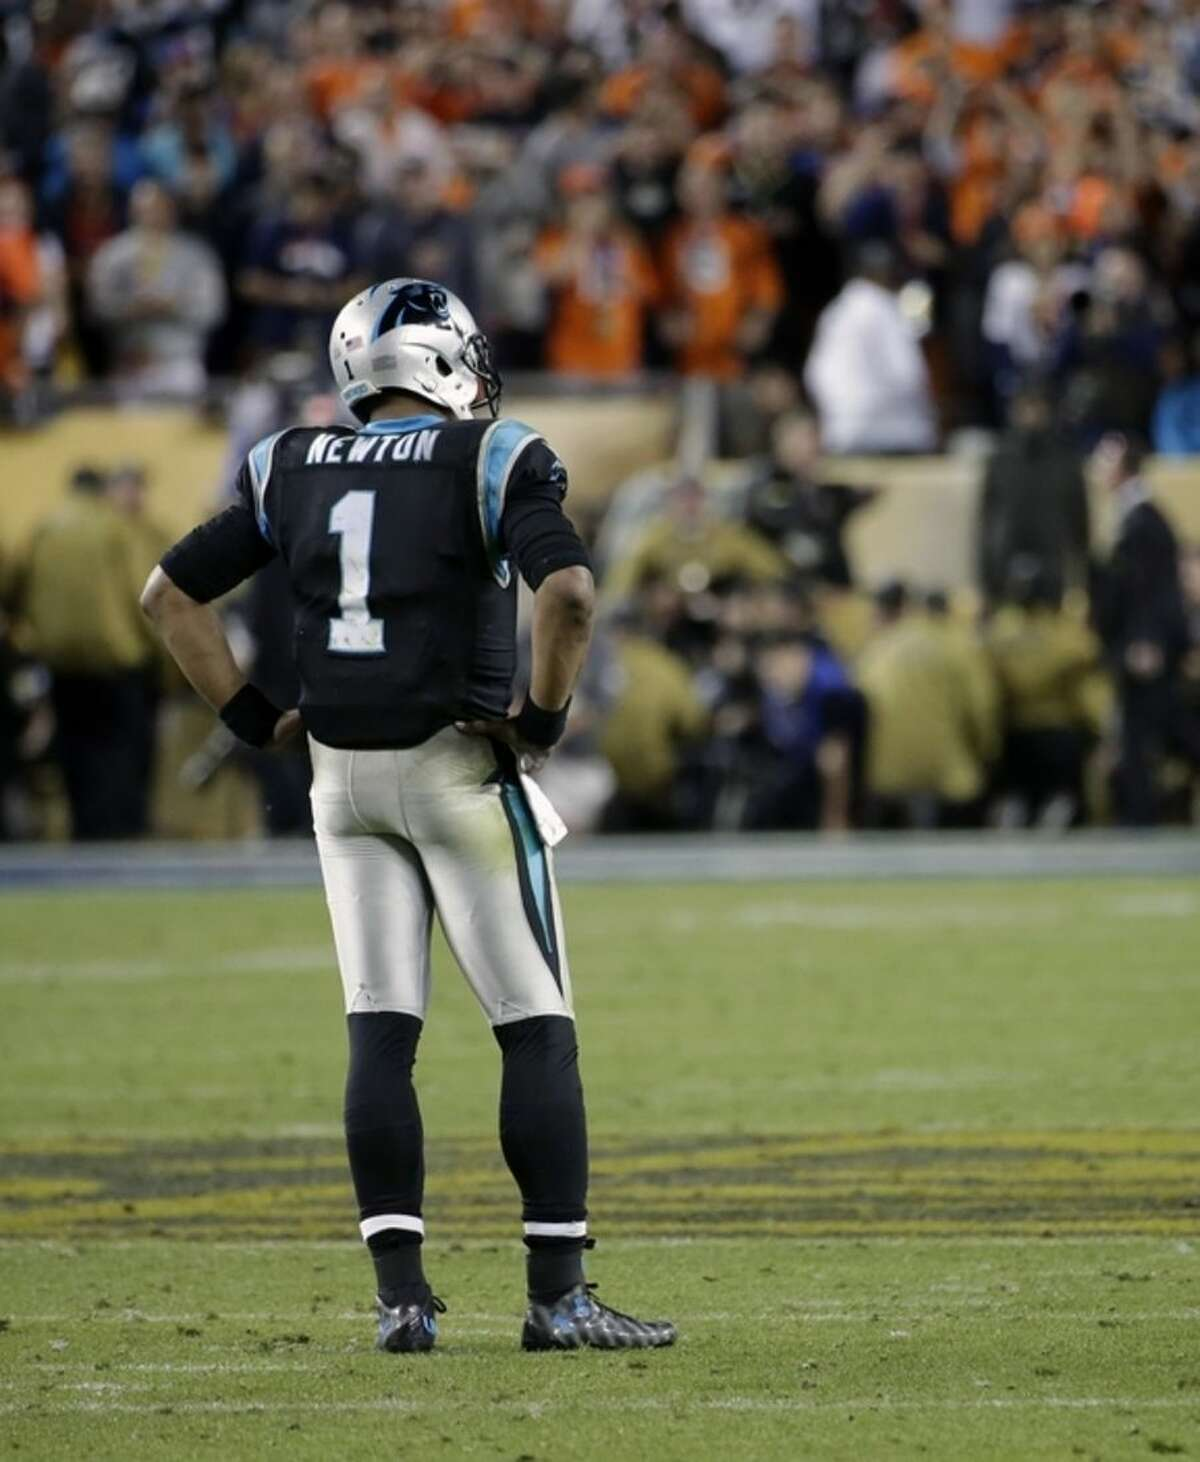 Carolina Panthers' Cam Newton (1) hangs his head during the second half of the NFL Super Bowl 50 football game Sunday, Feb. 7, 2016, in Santa Clara, Calif. (AP Photo/Matt York)